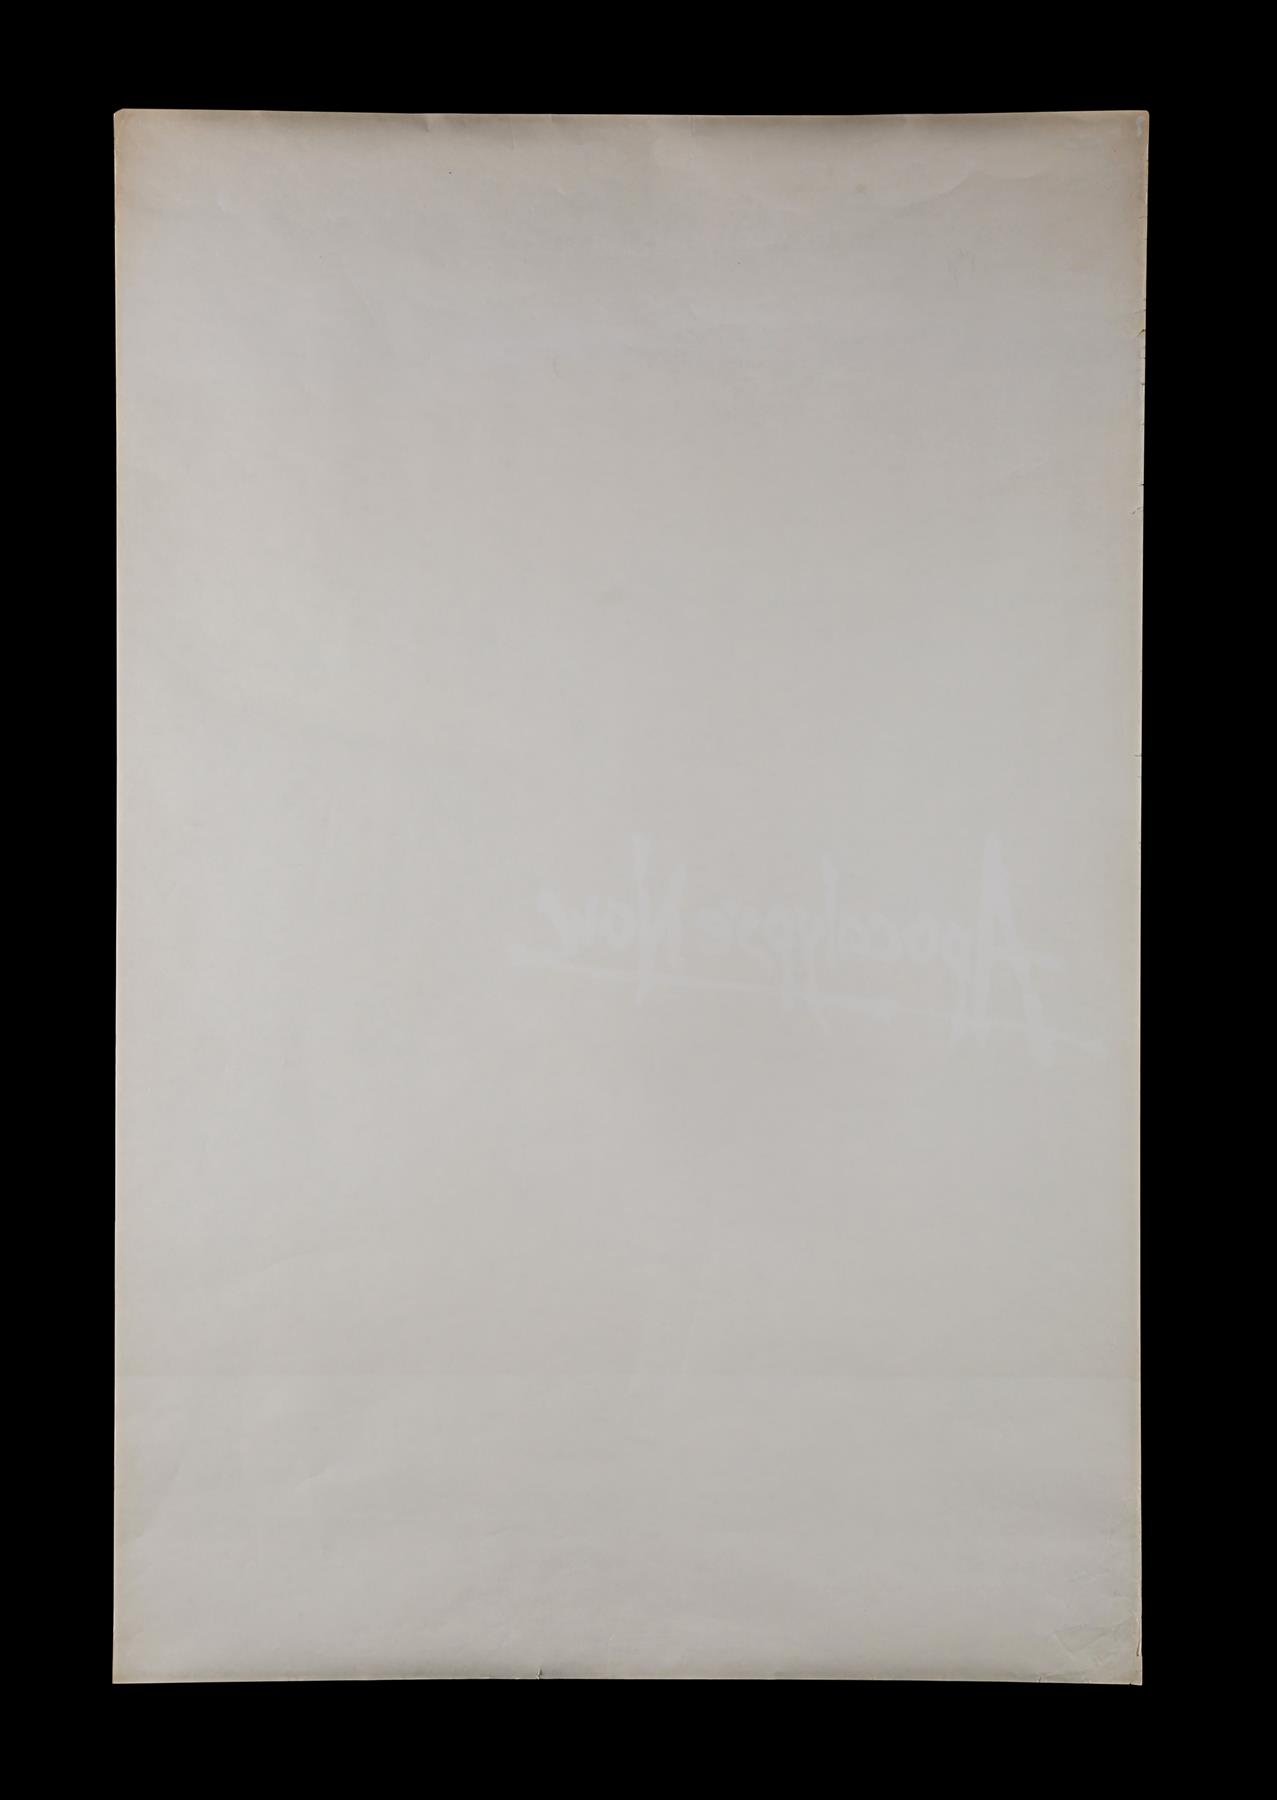 APOCALYPSE NOW (1979) - US One-Sheet, 1979 - Image 5 of 5